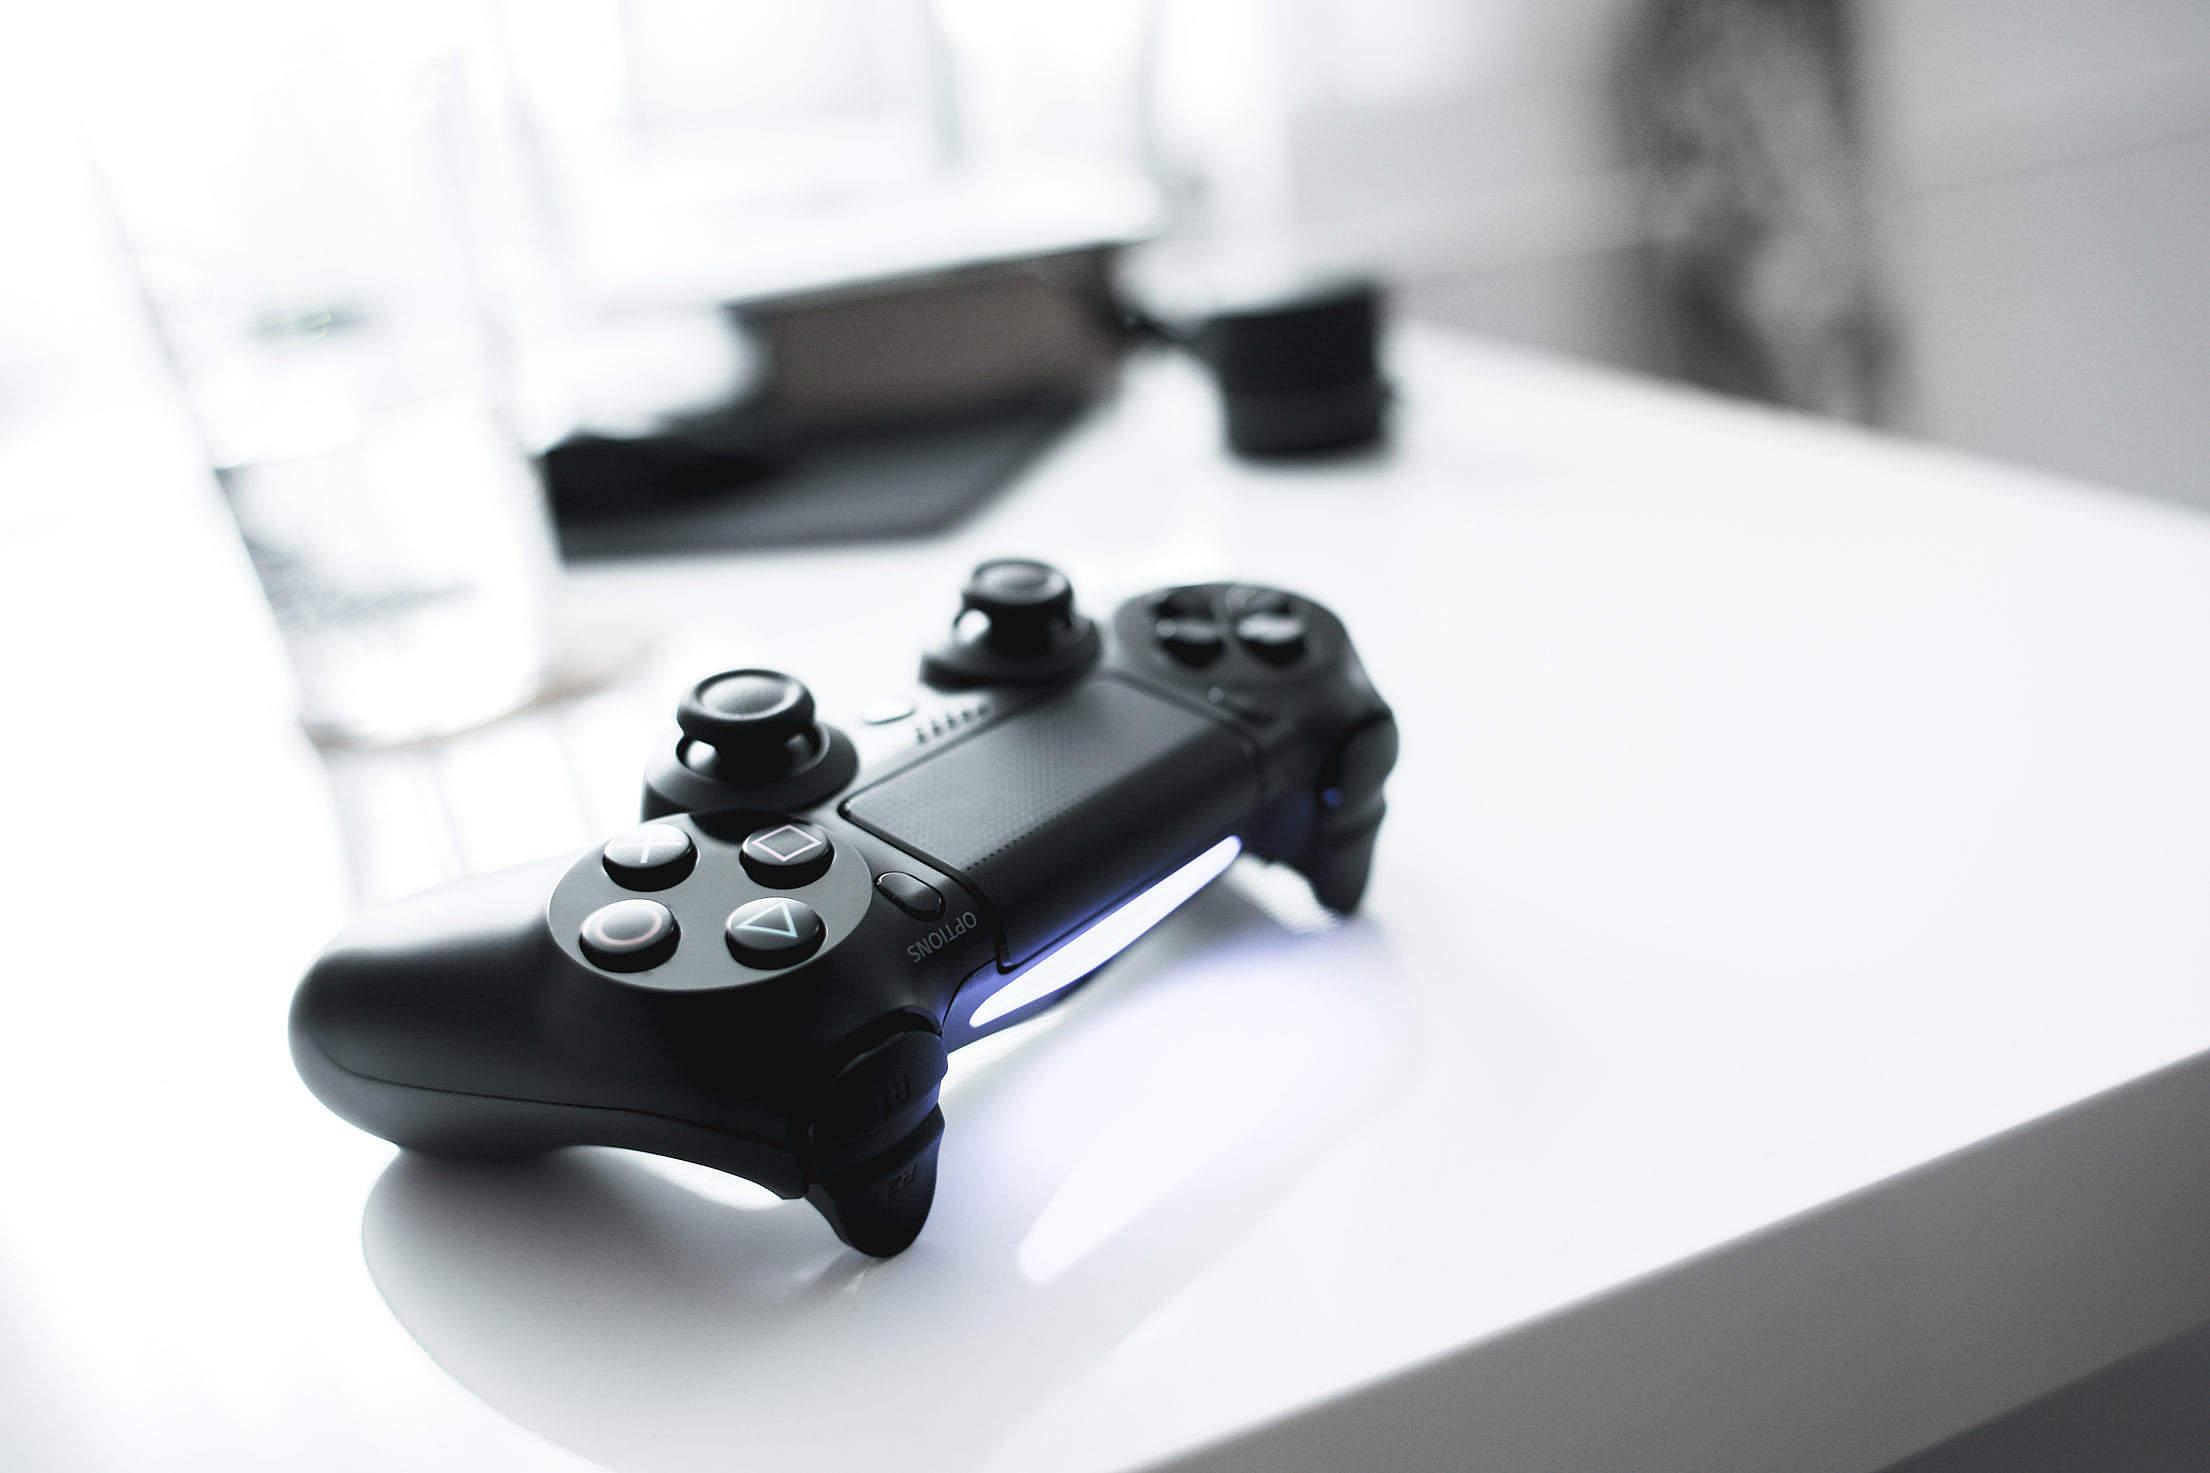 Sleek Playstation Controller Free Stock Photo